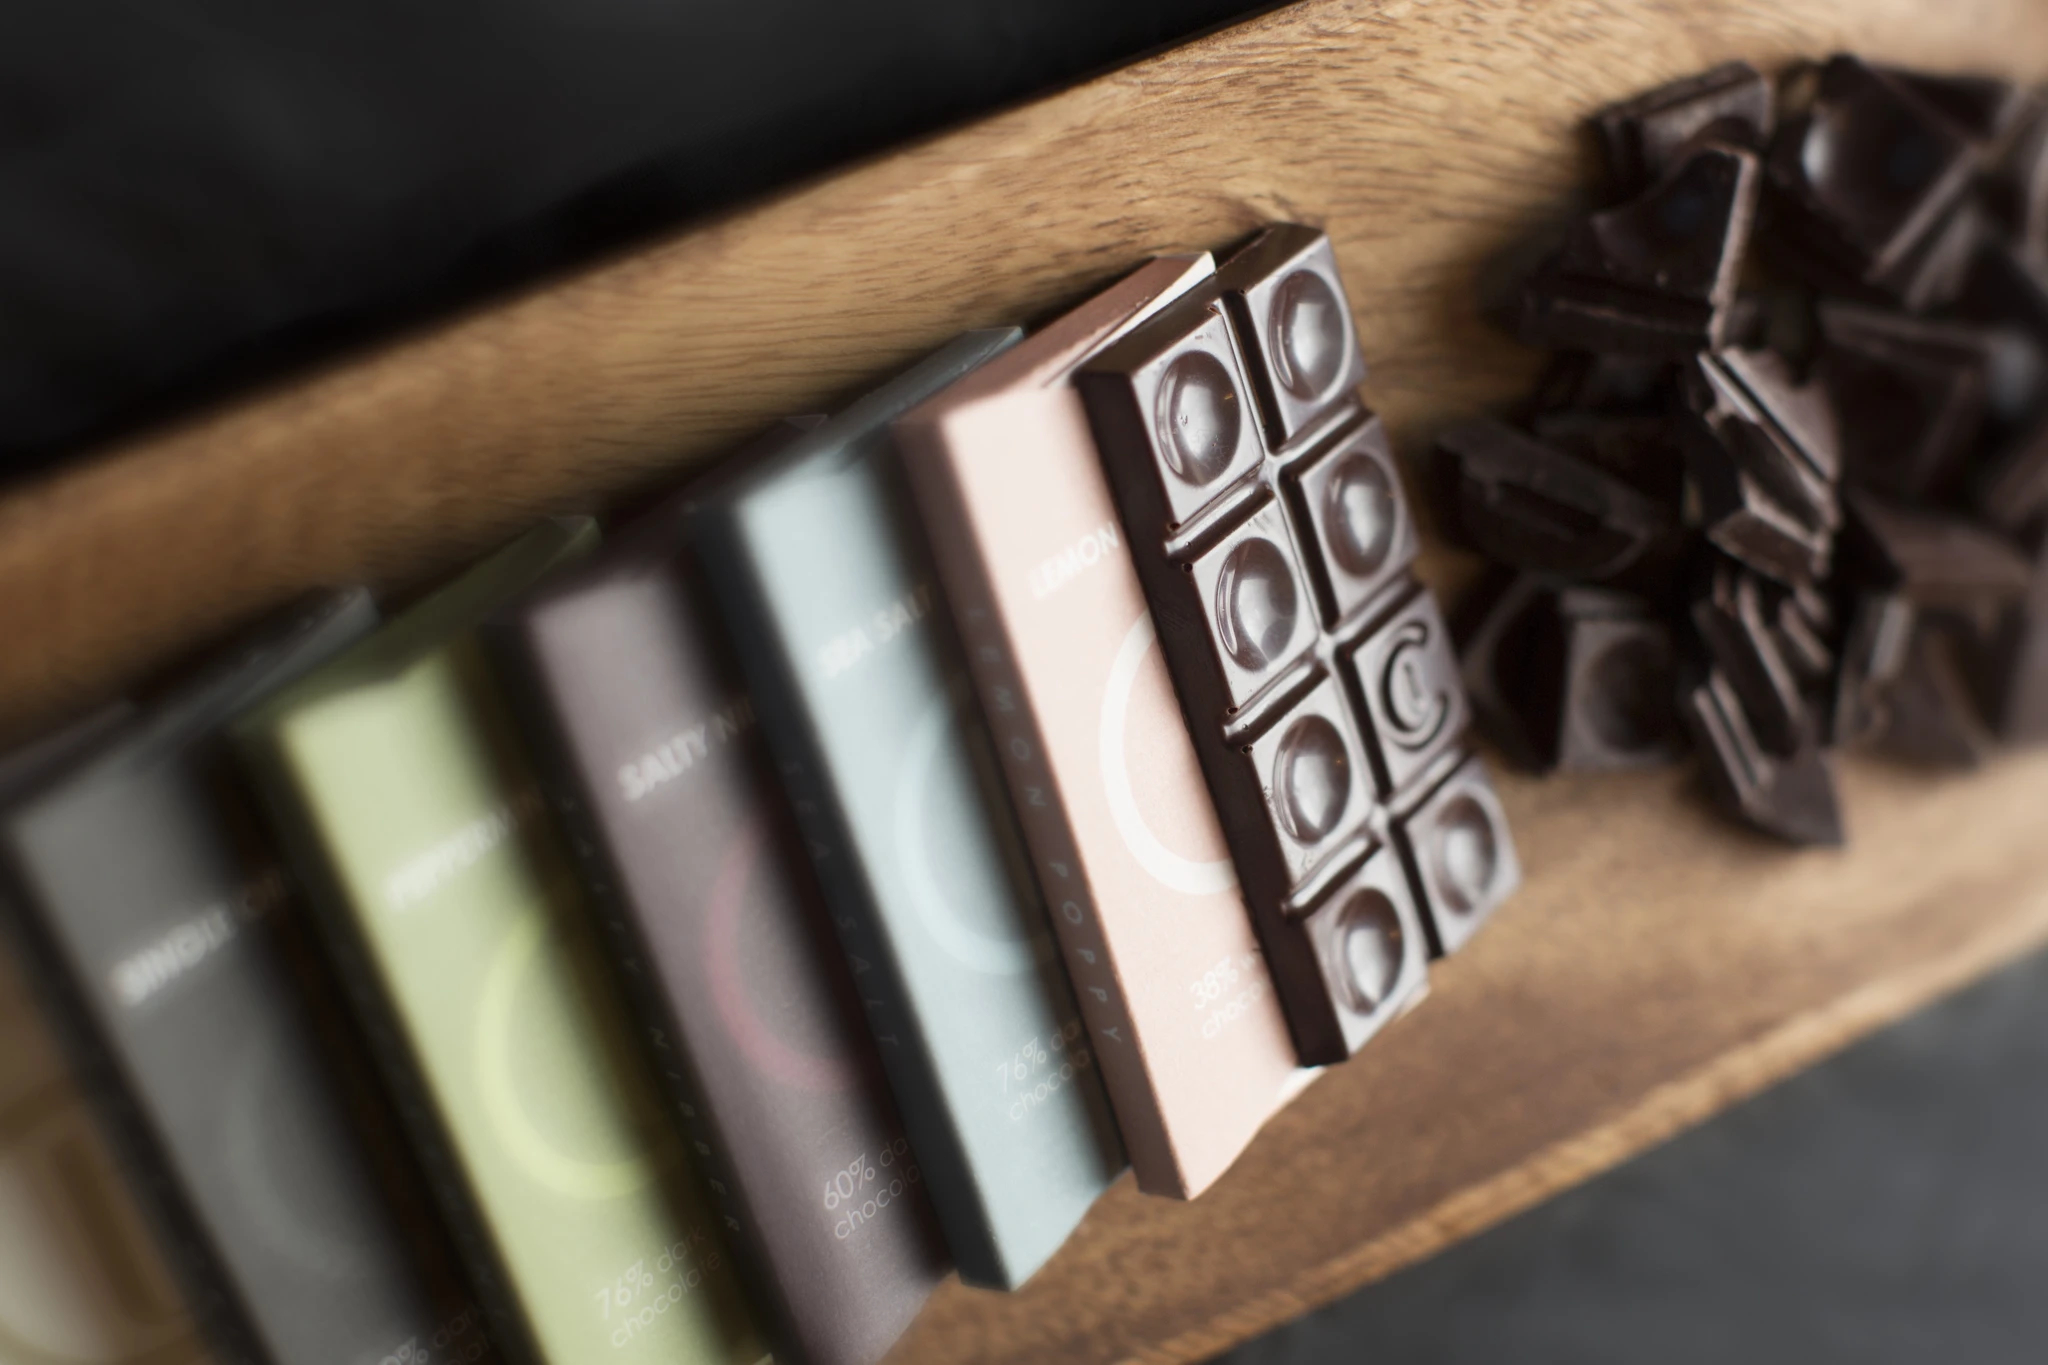 TC Chocolate